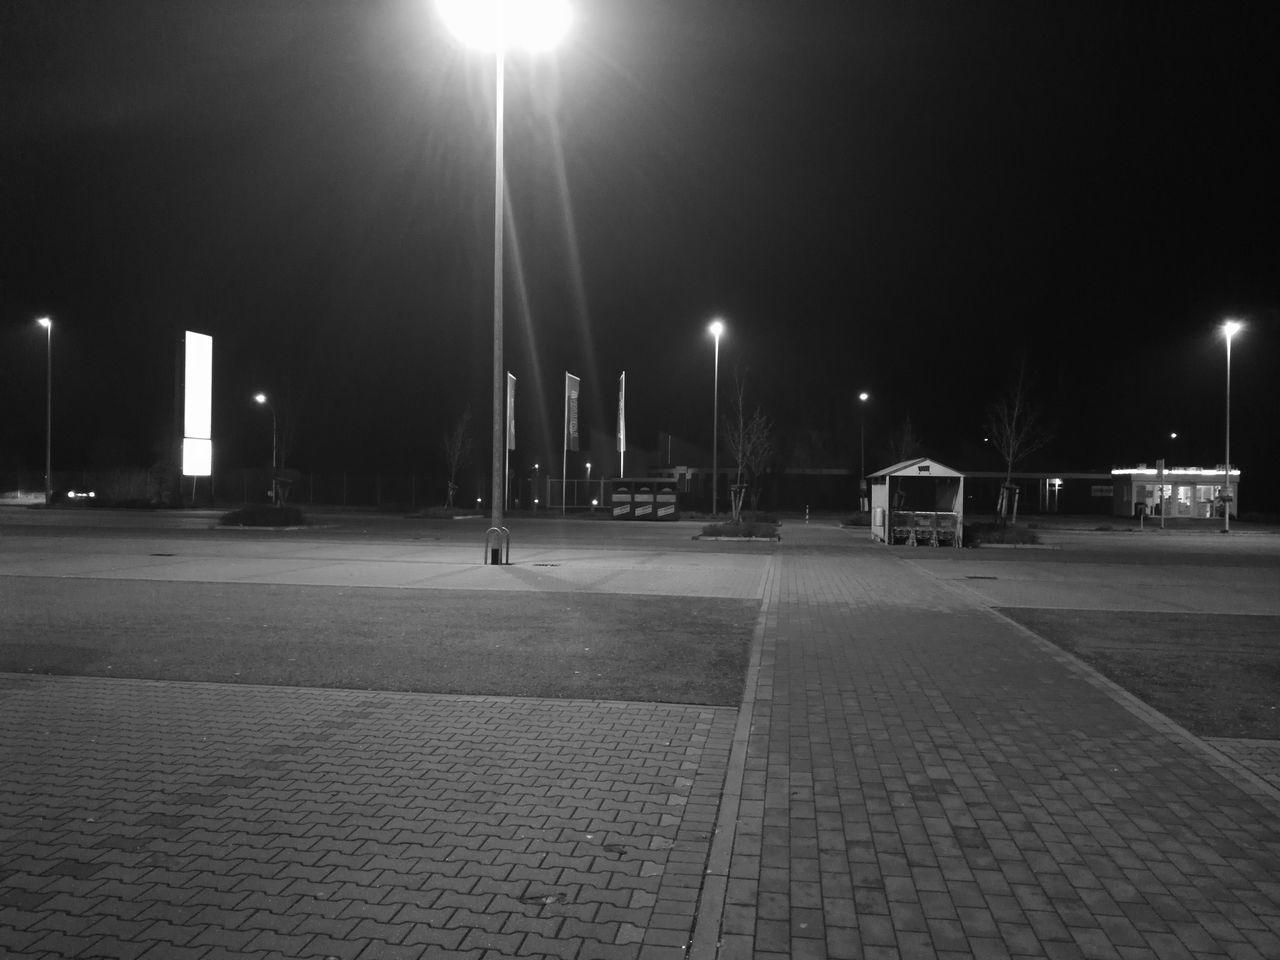 353/365 Schwarz Weiß auf dem Parkplatz Photooftheday Sorcerer86 Eyeemgermany Bilsbekblog Photo365 Eyeempinneberg Huaweiography Huaweimate9